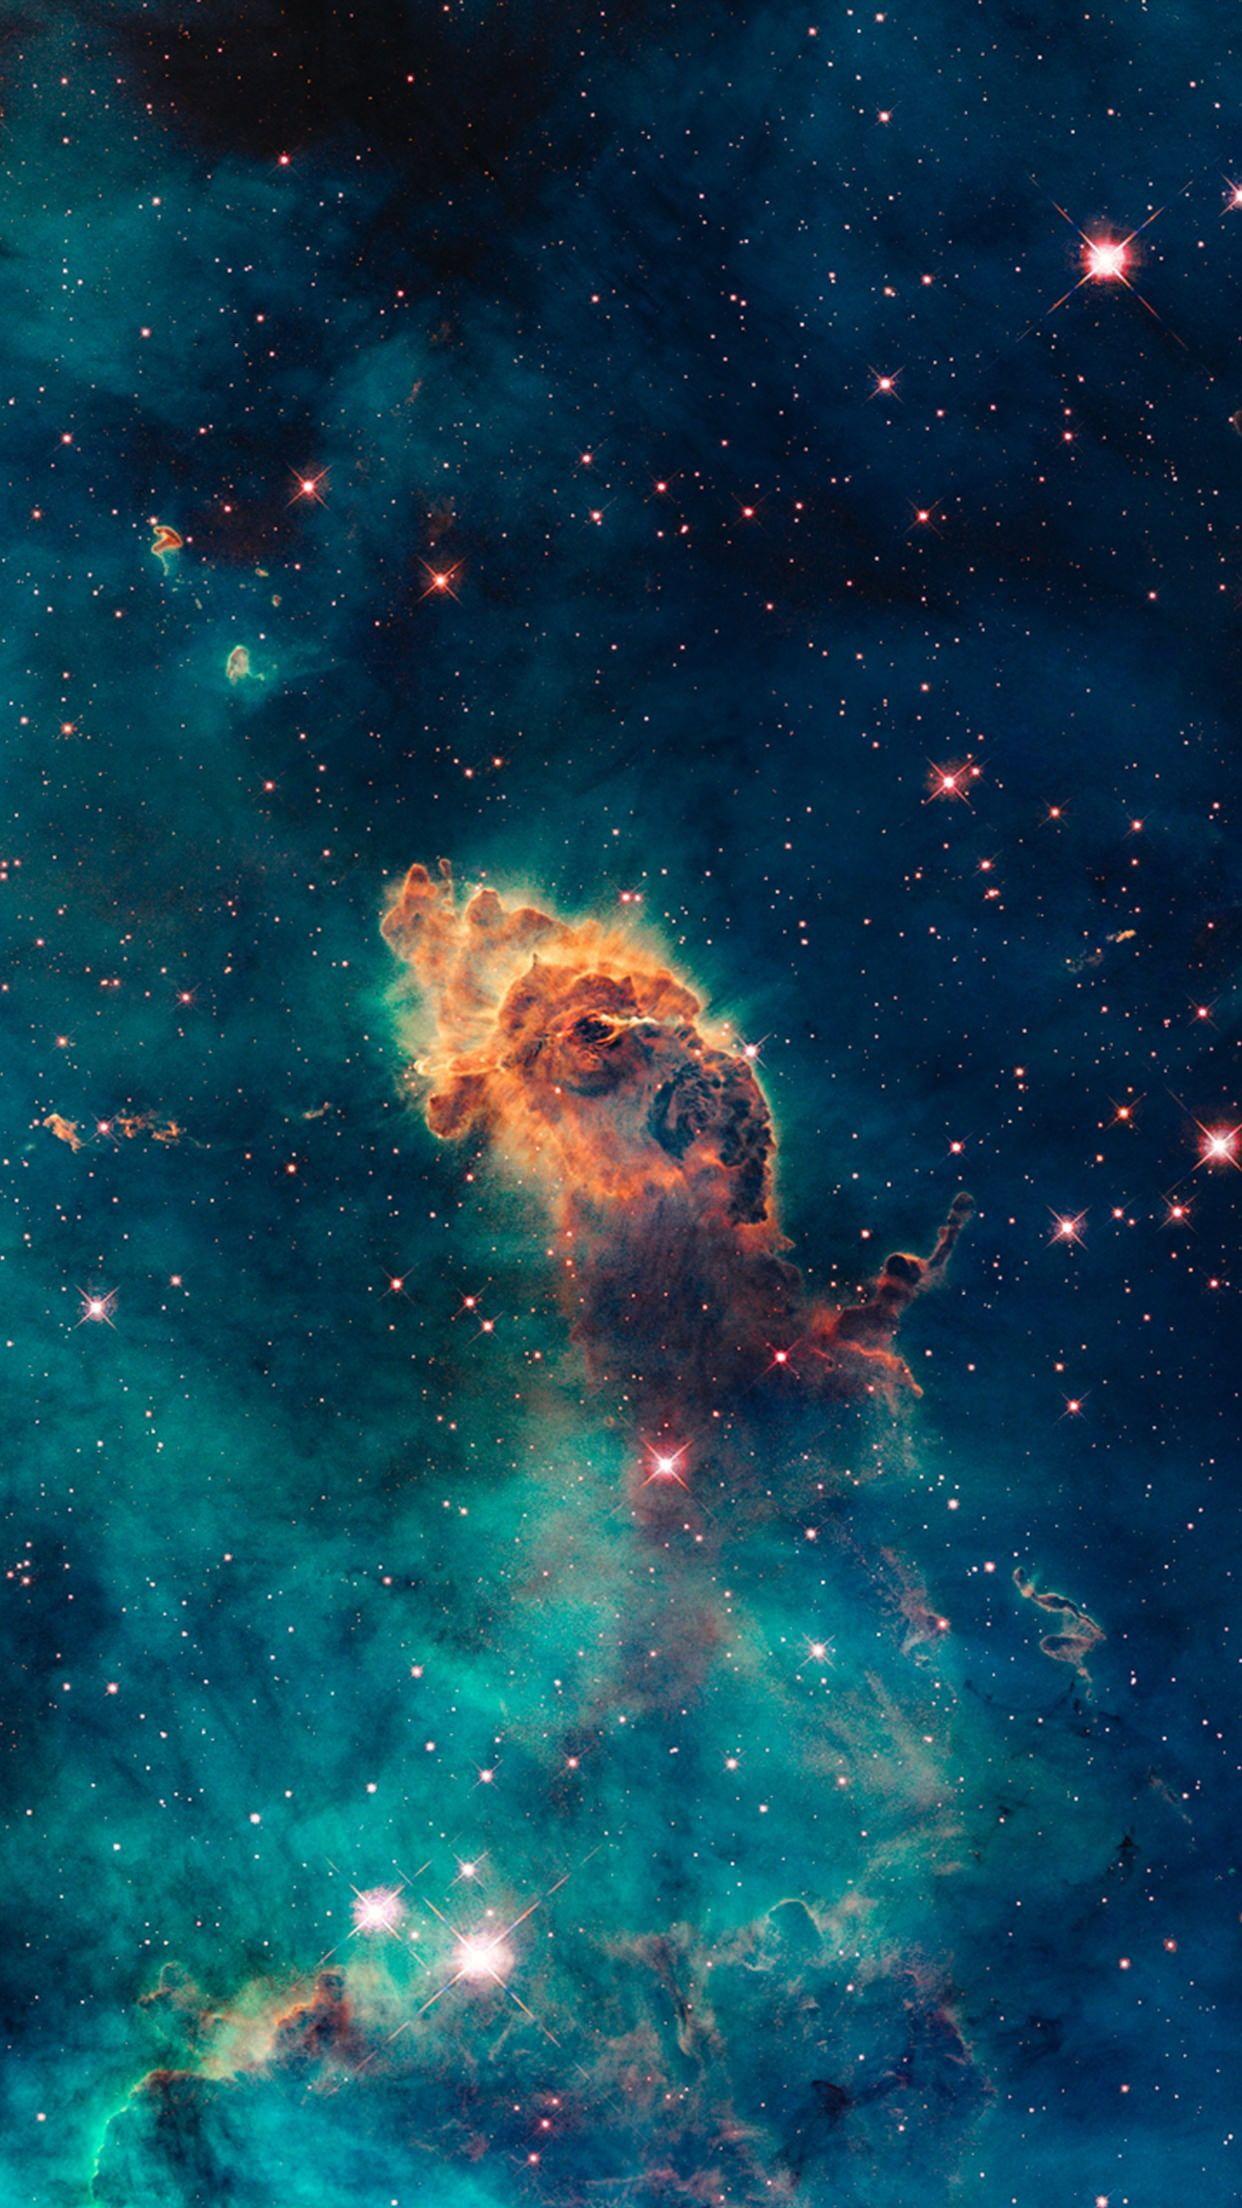 Space Galaxy Vertical Portrait Display 1080p Wallpaper Hdwallpaper Desktop Galaxy Art Galaxy Pictures Space Pictures